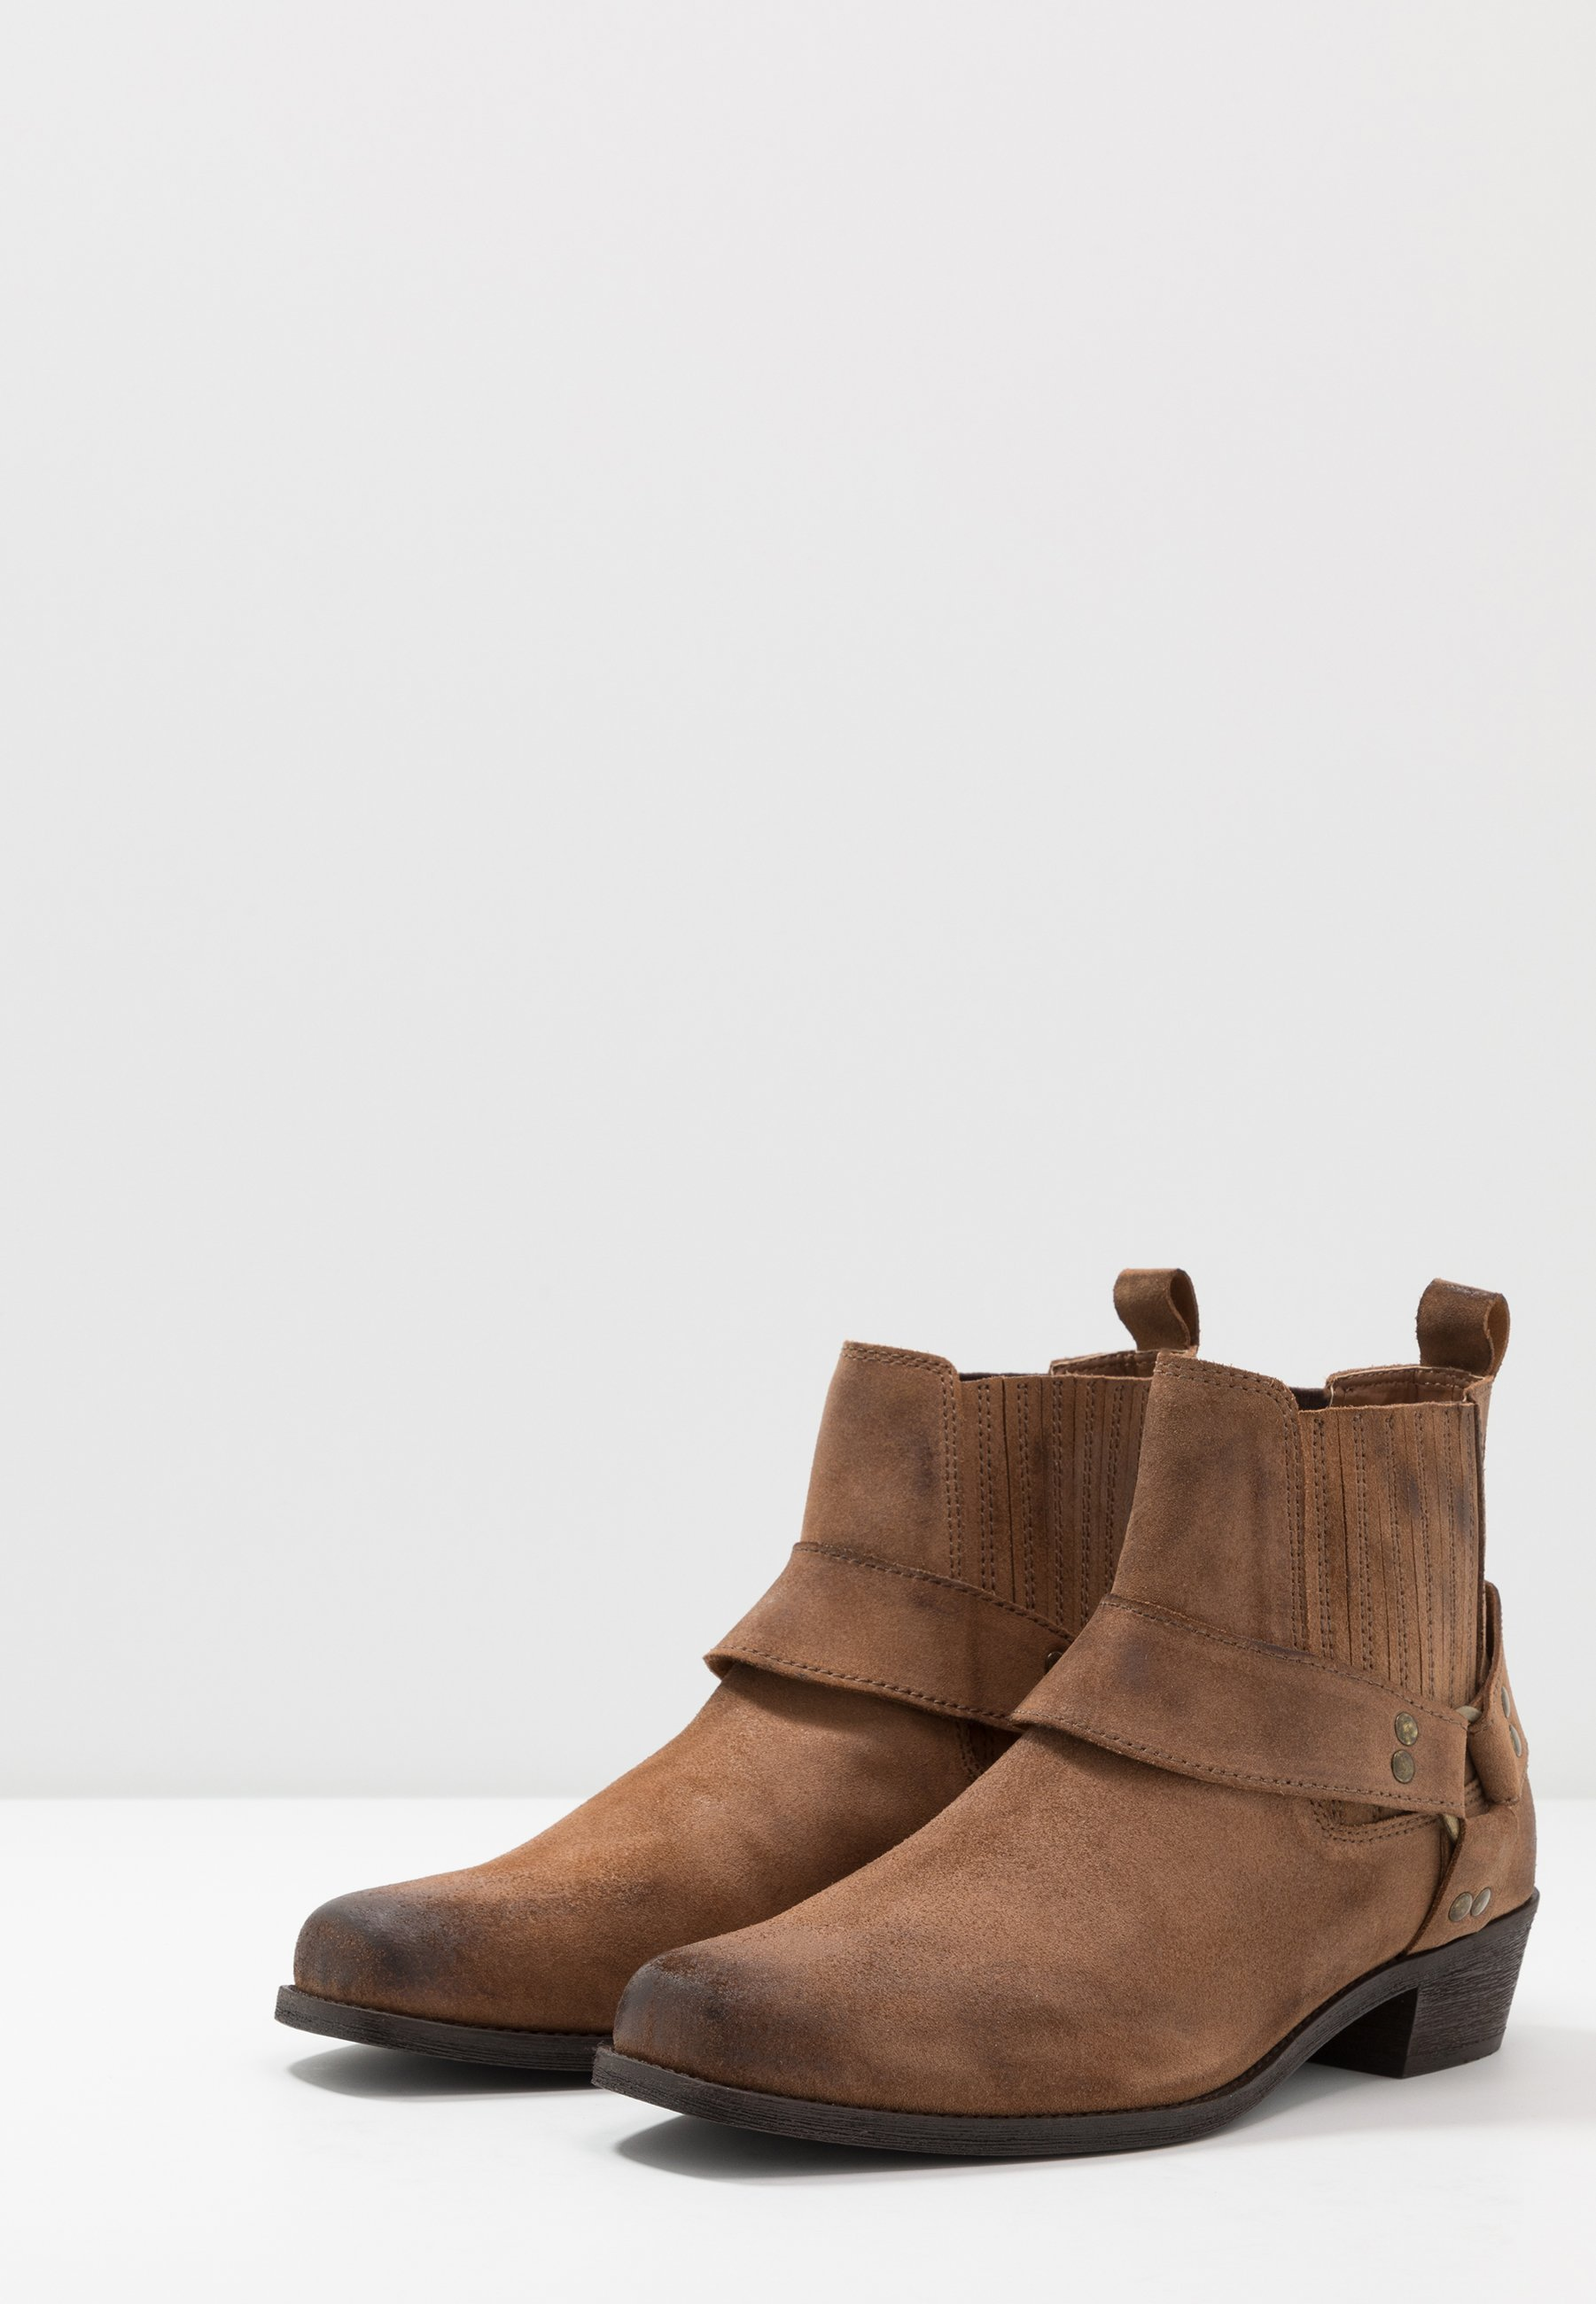 Designer Cheapest Zign Classic ankle boots - brown | men's shoes 2020 ET7o4